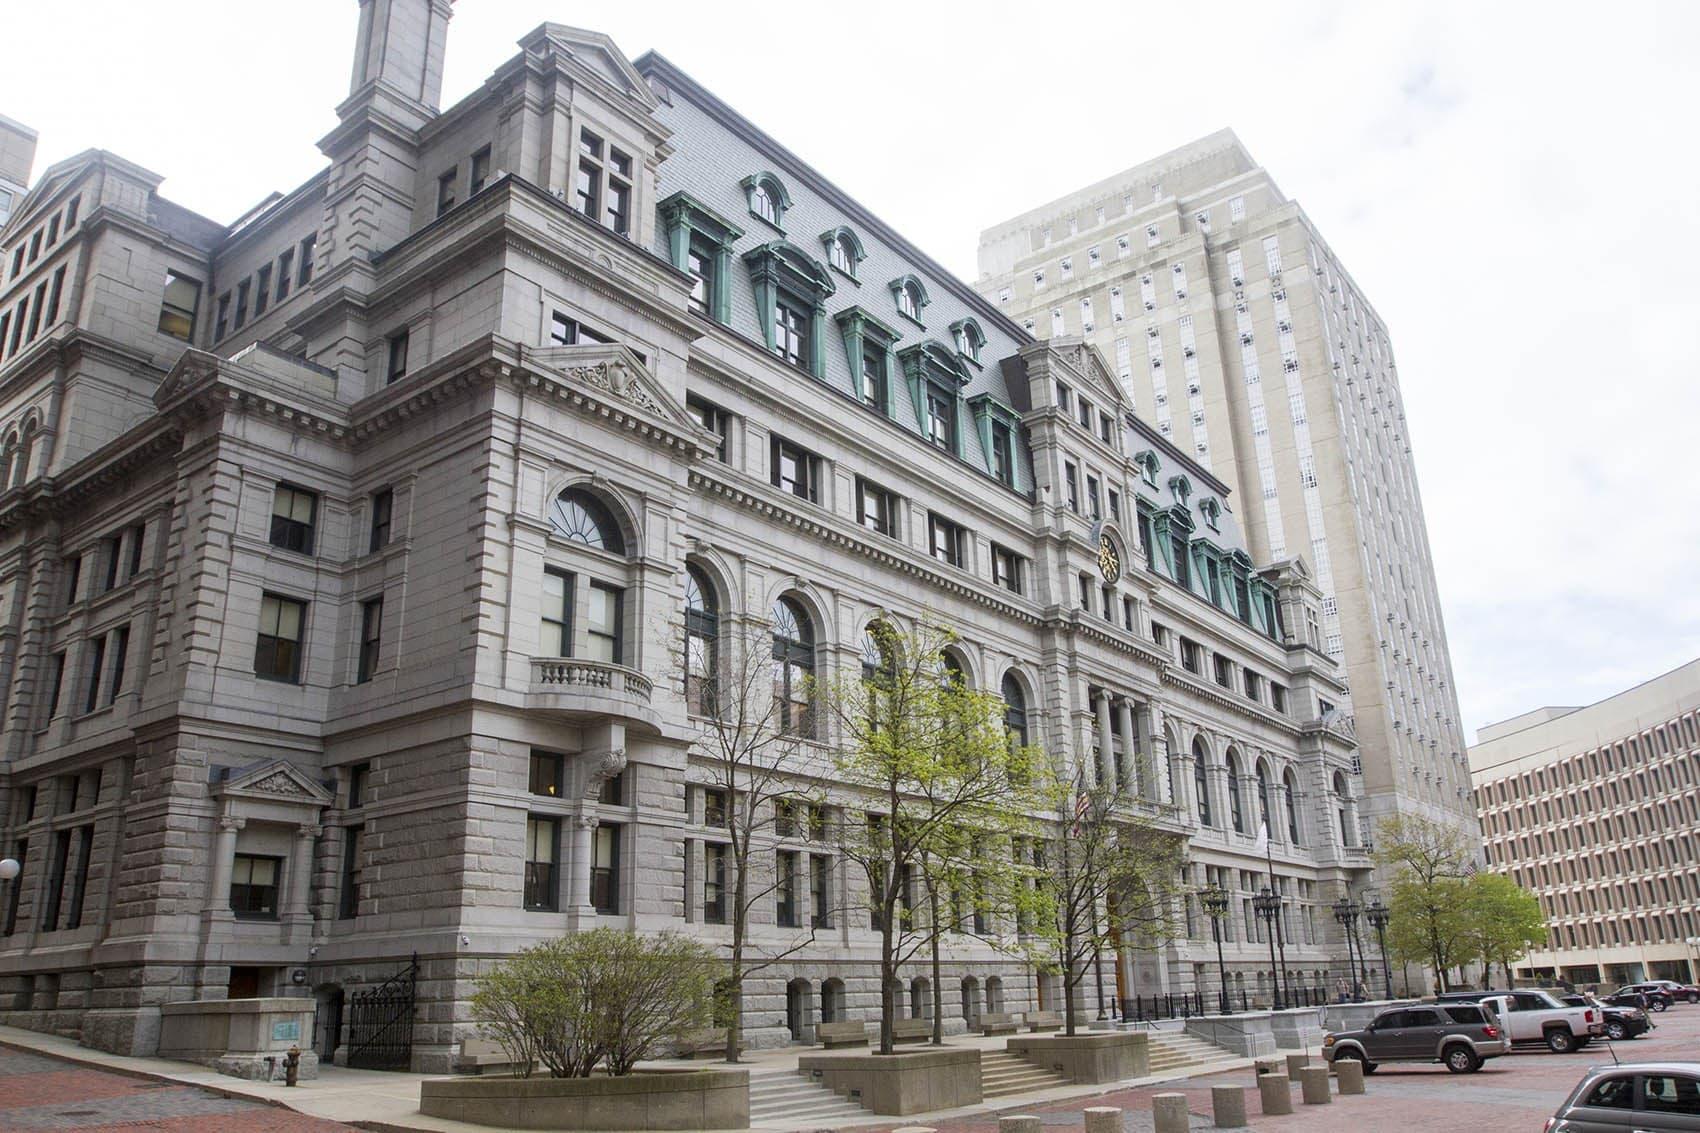 John Adams Courthouse, home of the Massachusetts Supreme Judicial Court. (Joe Difazio for WBUR)